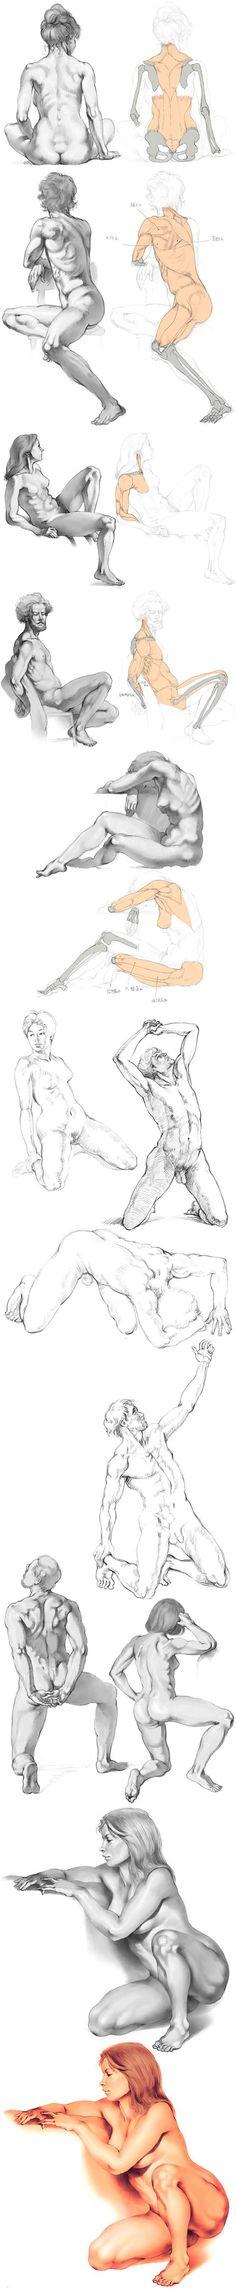 Anatomi / Anatomy | Find us on > https://www.facebook.com/maviturta , https://instagram.com/maviturta/ , https://twitter.com/maviturta , https://www.facebook.com/groups/maviturta/ #Anatomi #anatomy #drawing #design #sketch #sketching #character #digital #digitalpainting